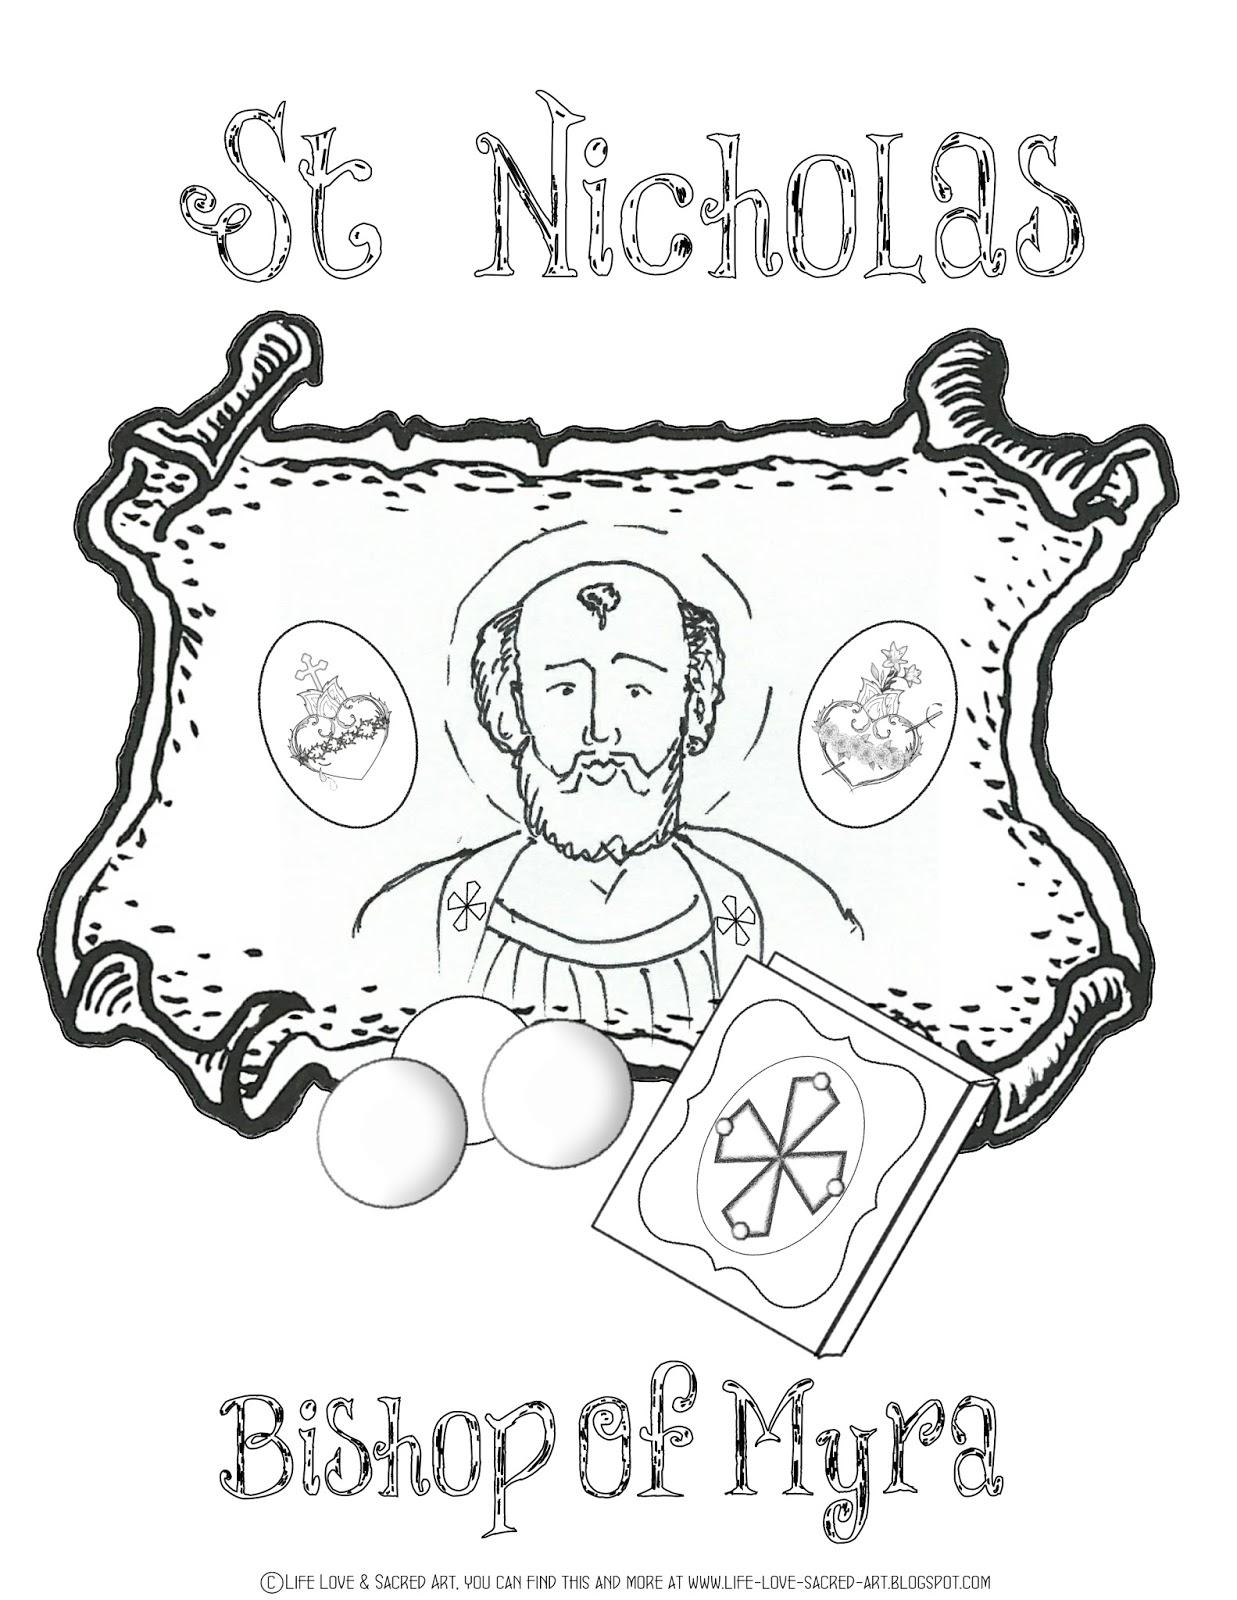 Life, Love, & Sacred Art: St. Nicholas Giveaway & FREE